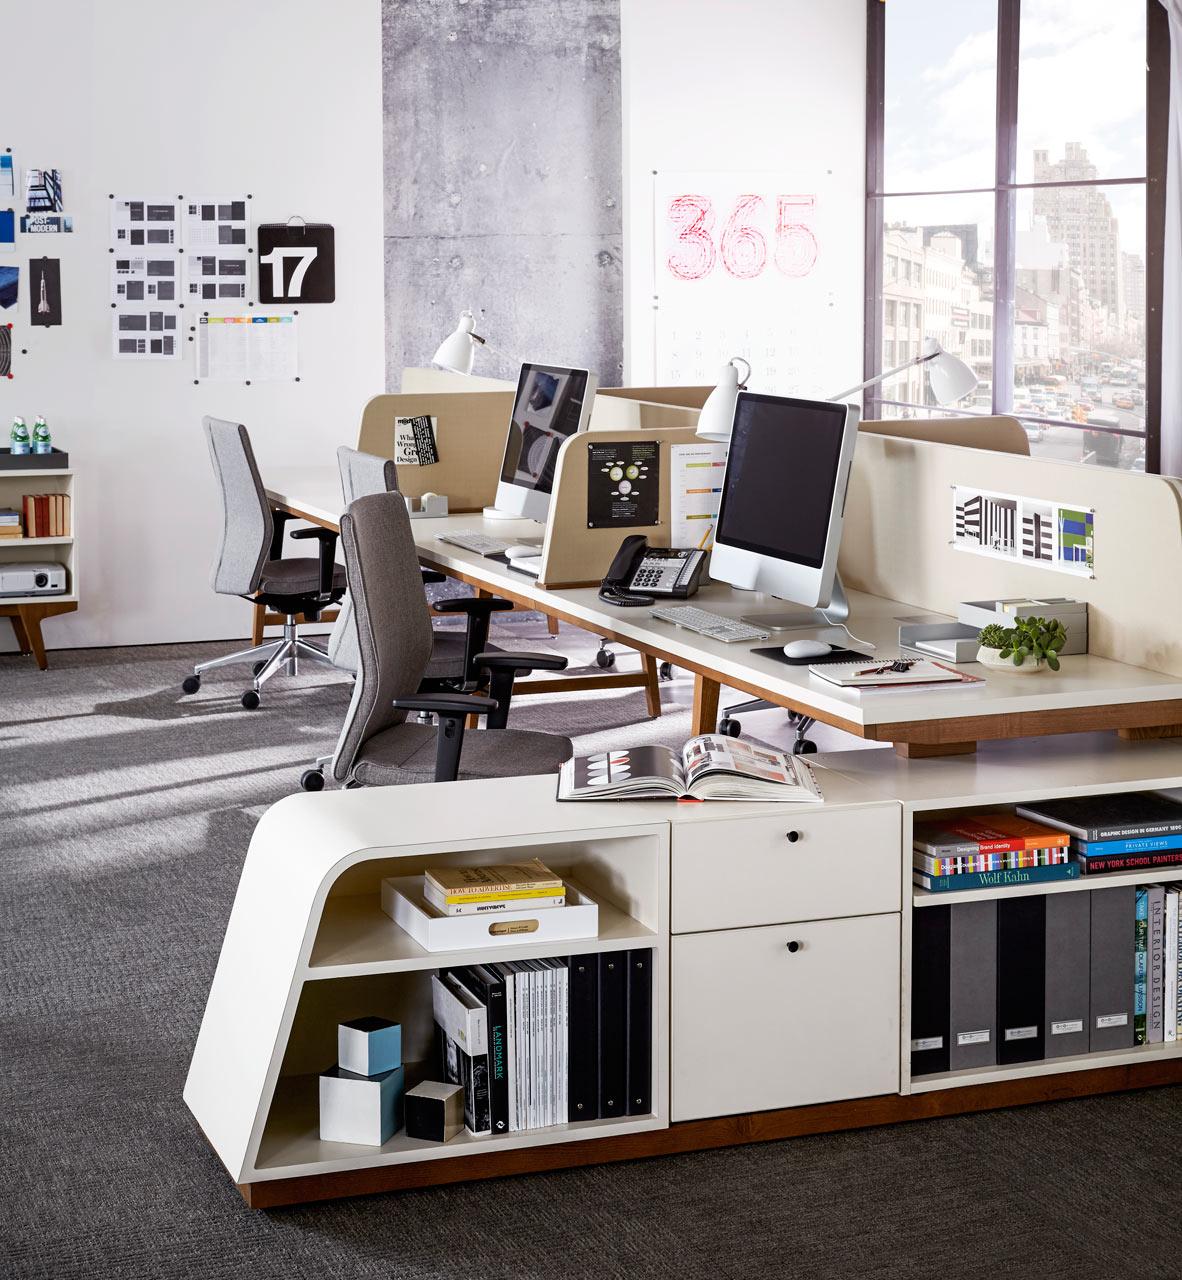 West Elm Workspace Office Furniture Design Milk